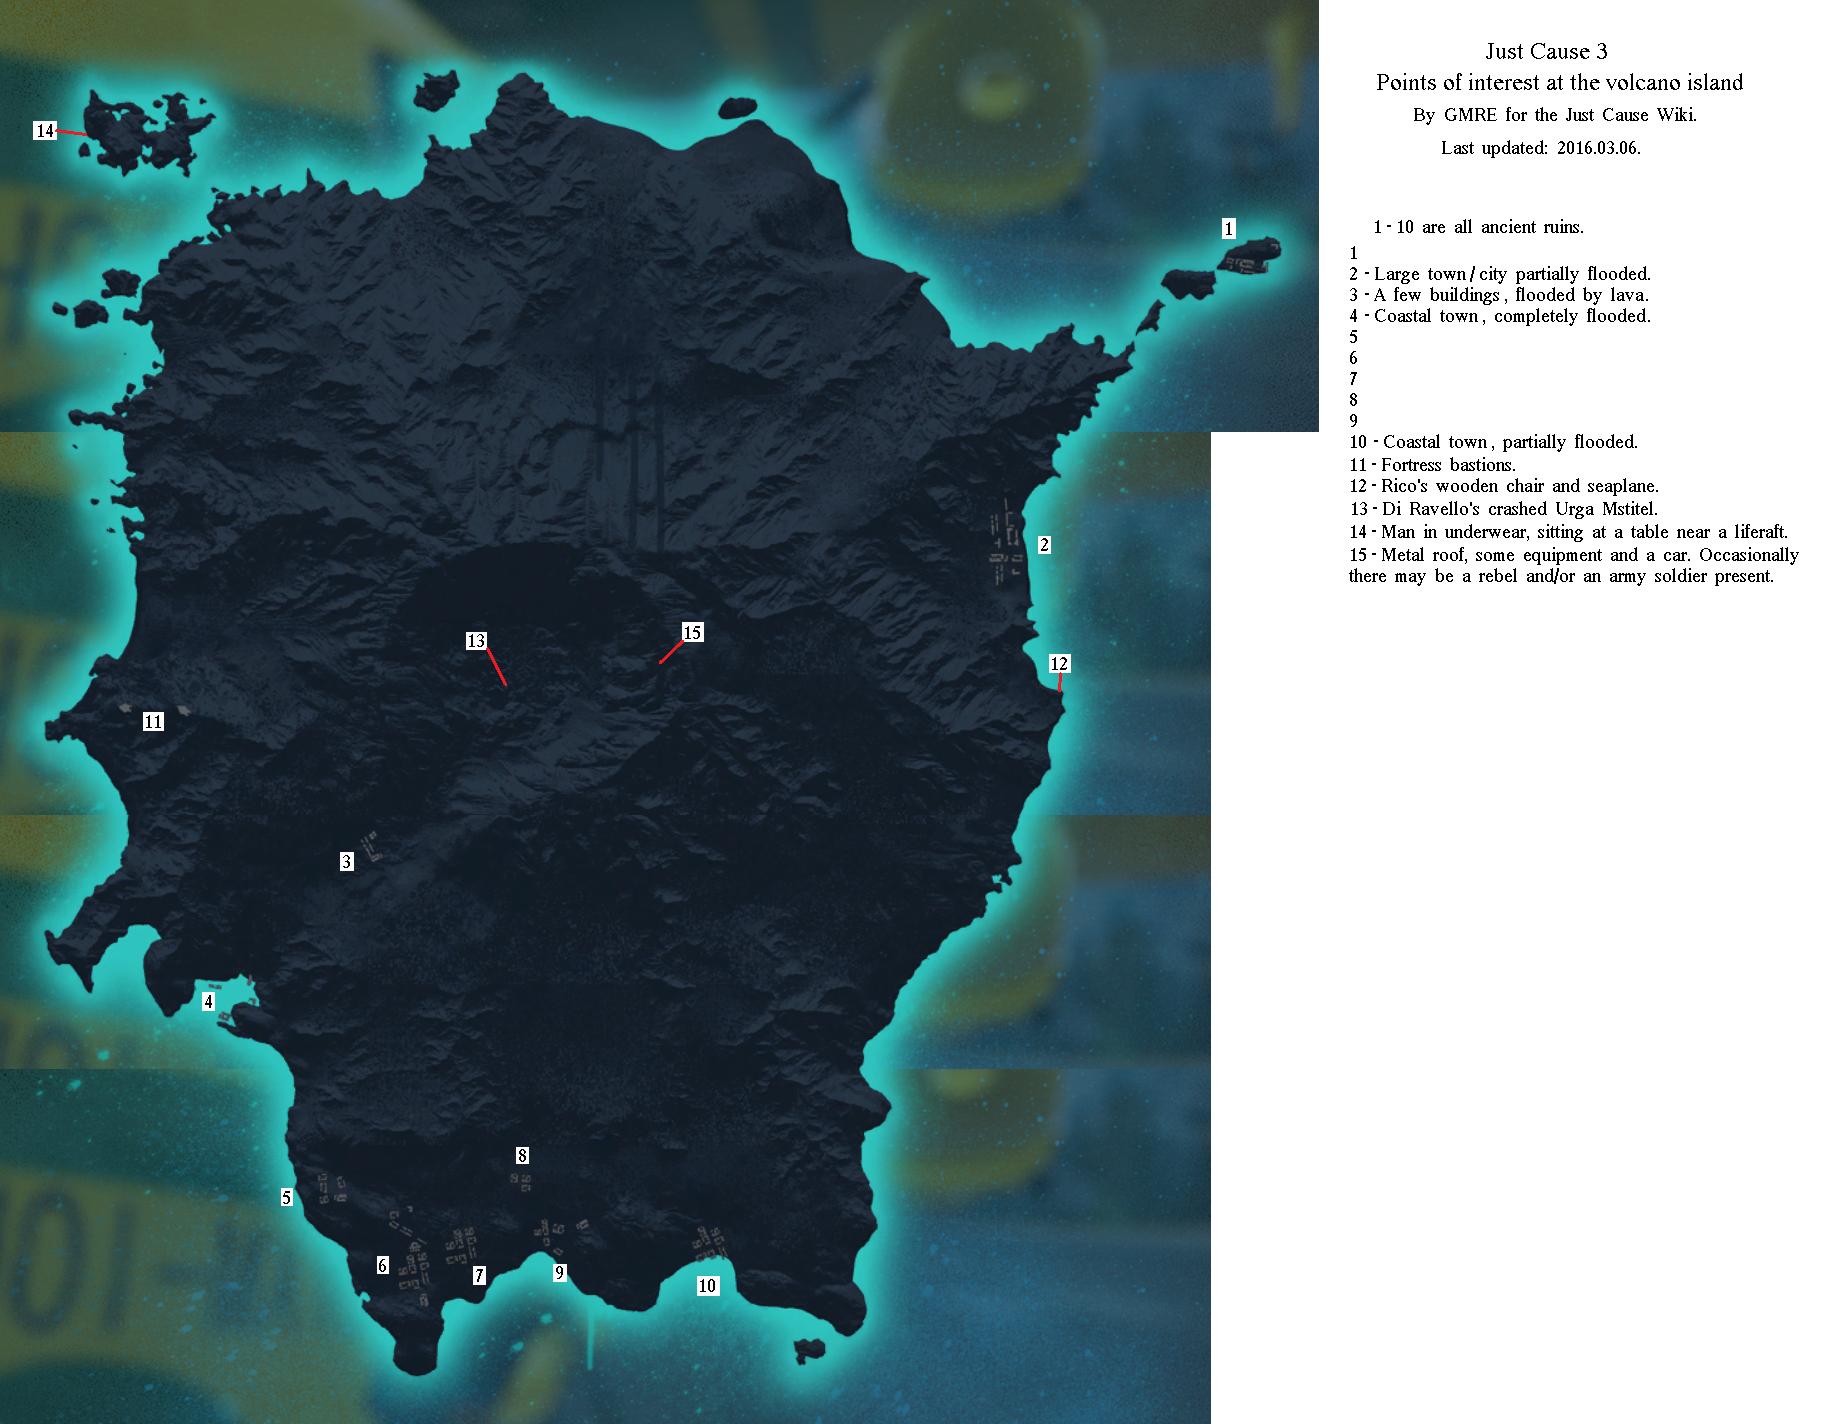 JC3 volcano island points of interest map